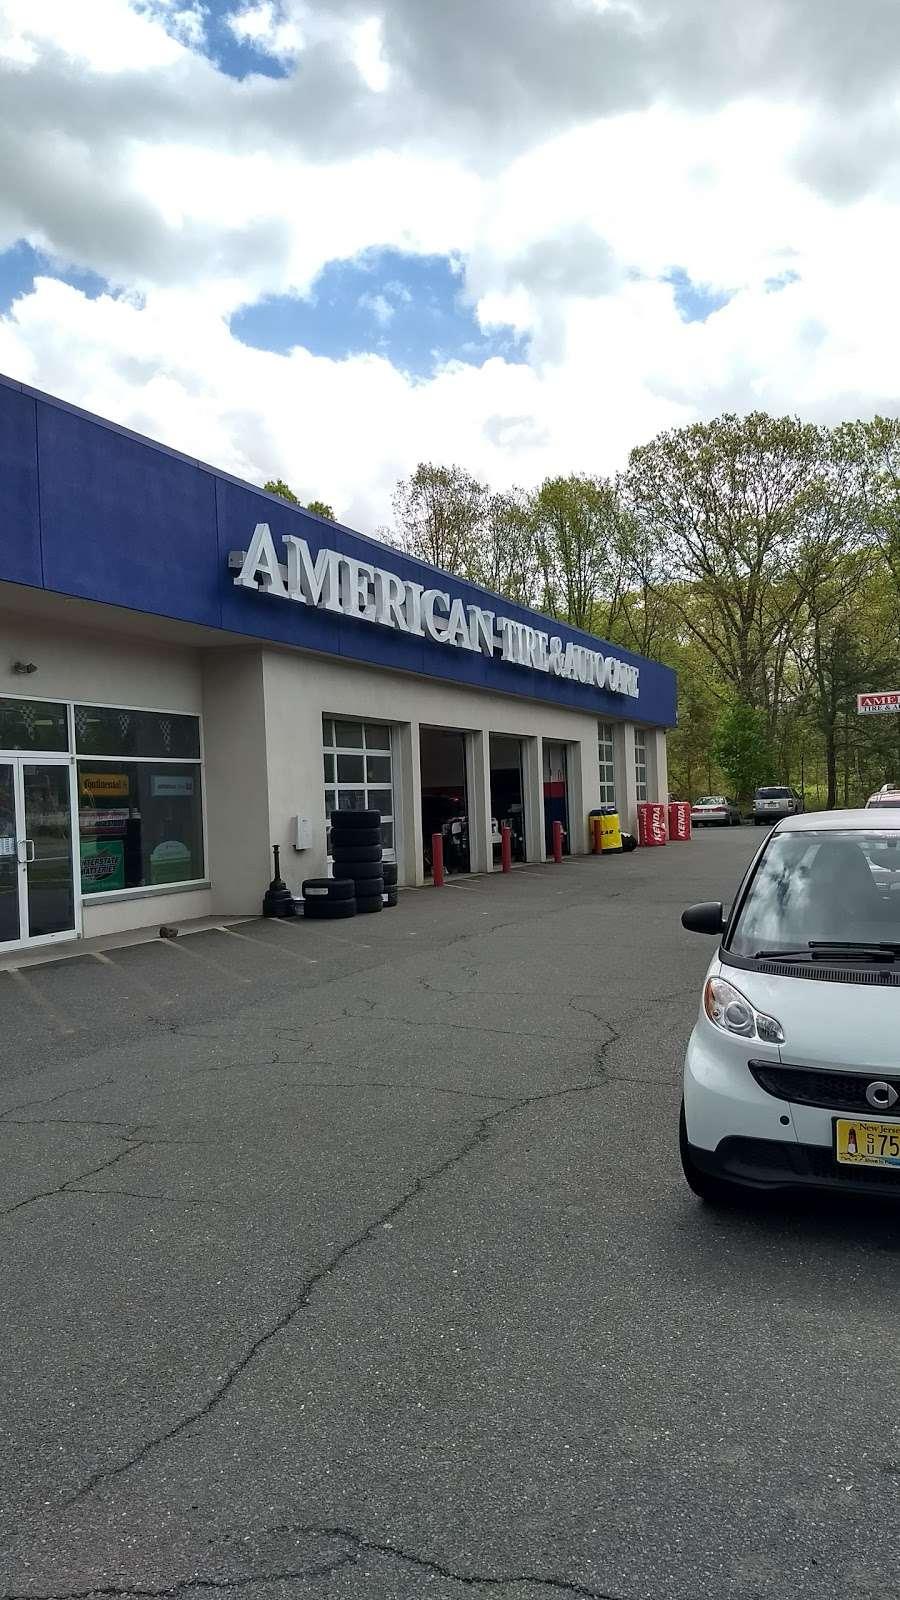 American Tire & Auto Care - car repair  | Photo 2 of 10 | Address: 2302 County Rd 516, Old Bridge, NJ 08857, USA | Phone: (732) 210-6444